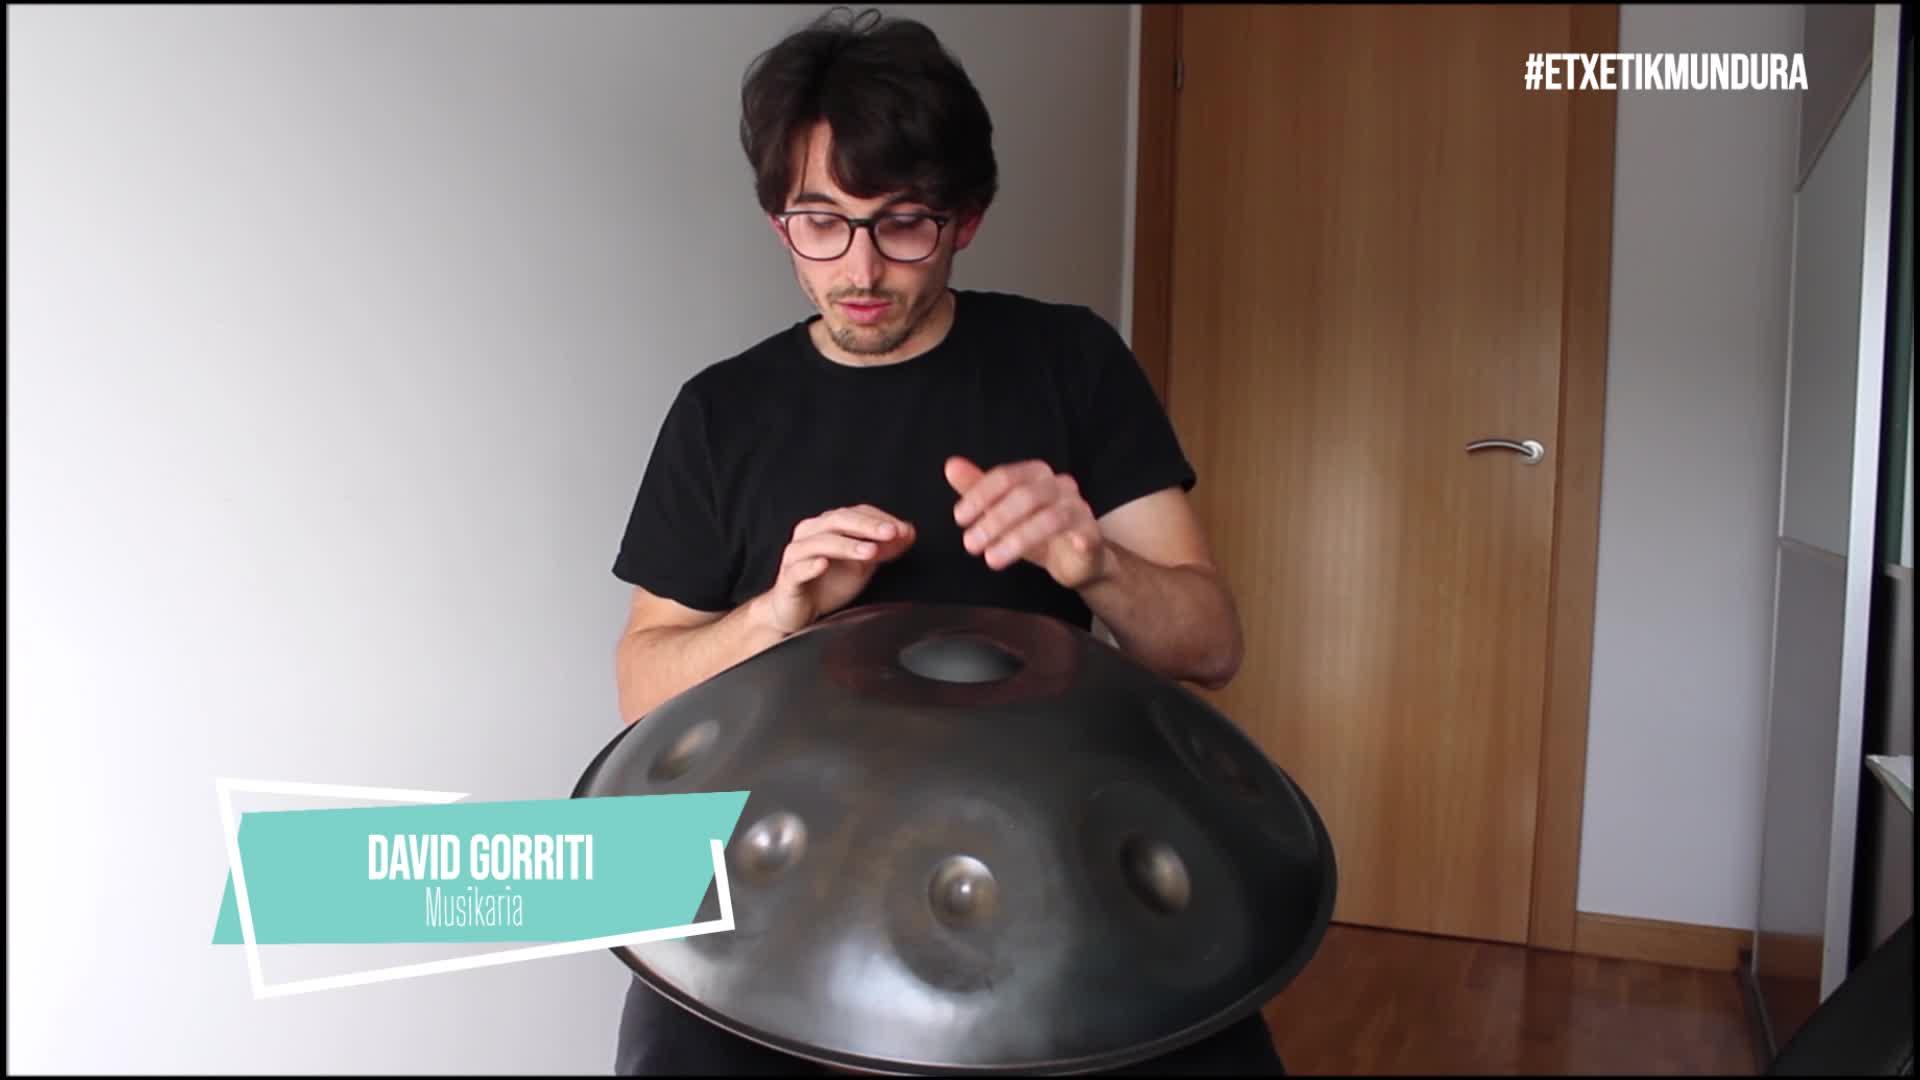 David Gorriti musikaria, etxetik mundura